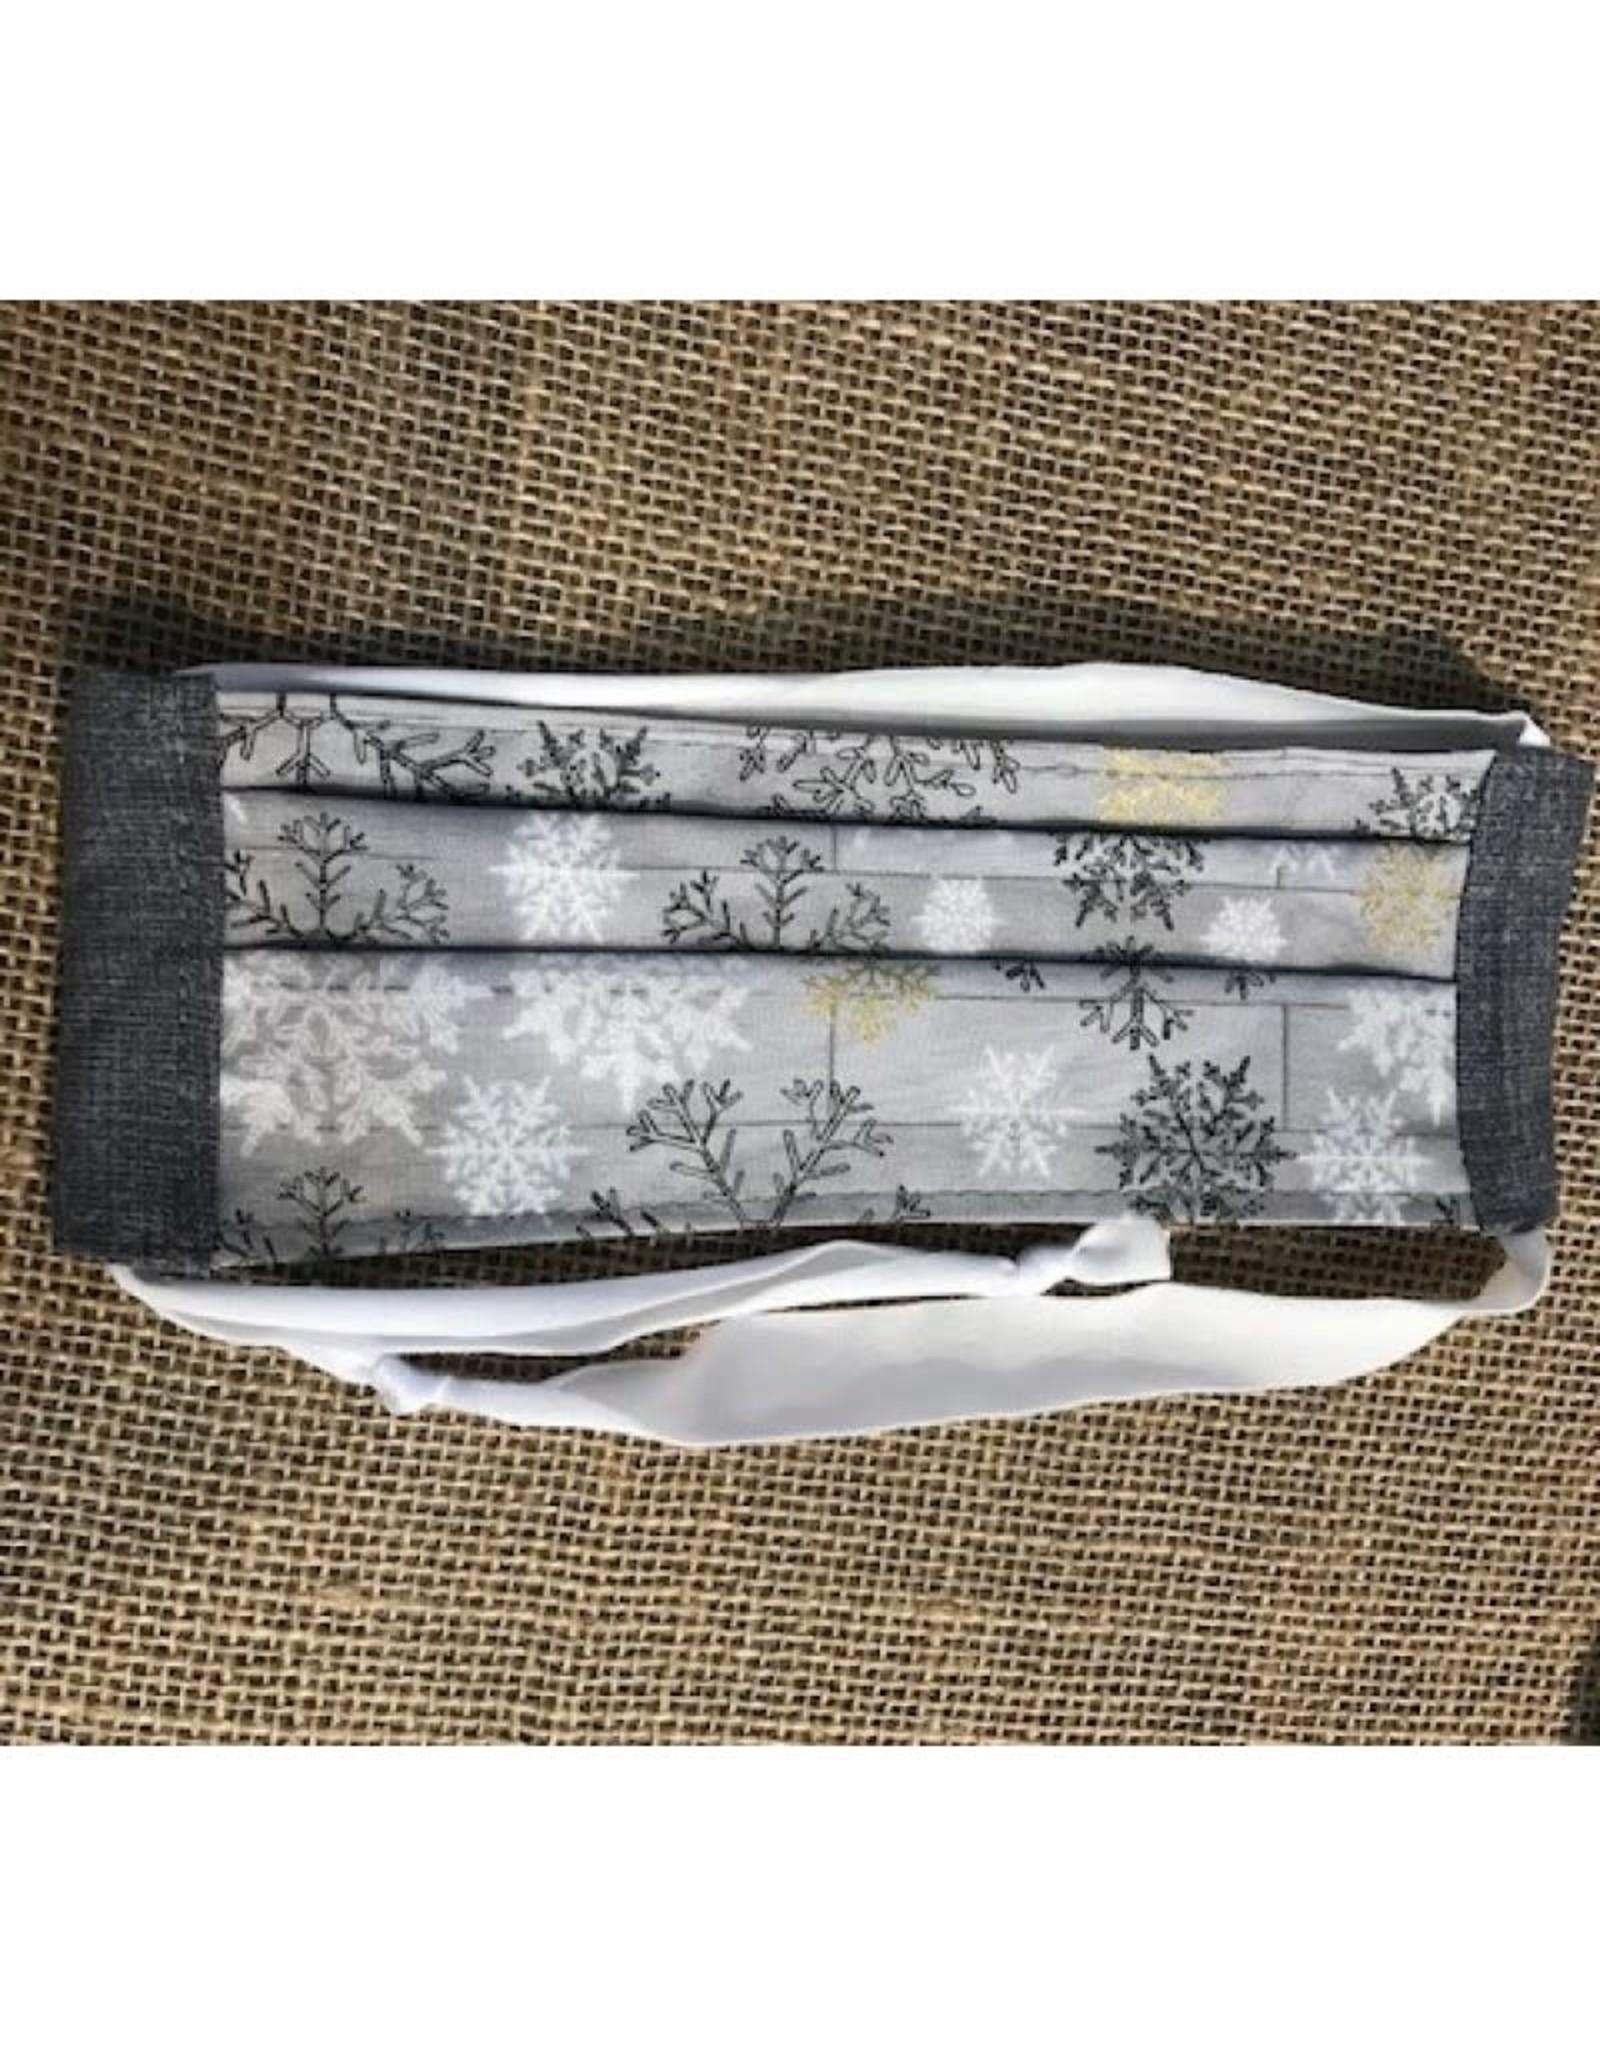 Bear Den Handmade Cotton Mask - Snowflakes - Gray on Barnwood